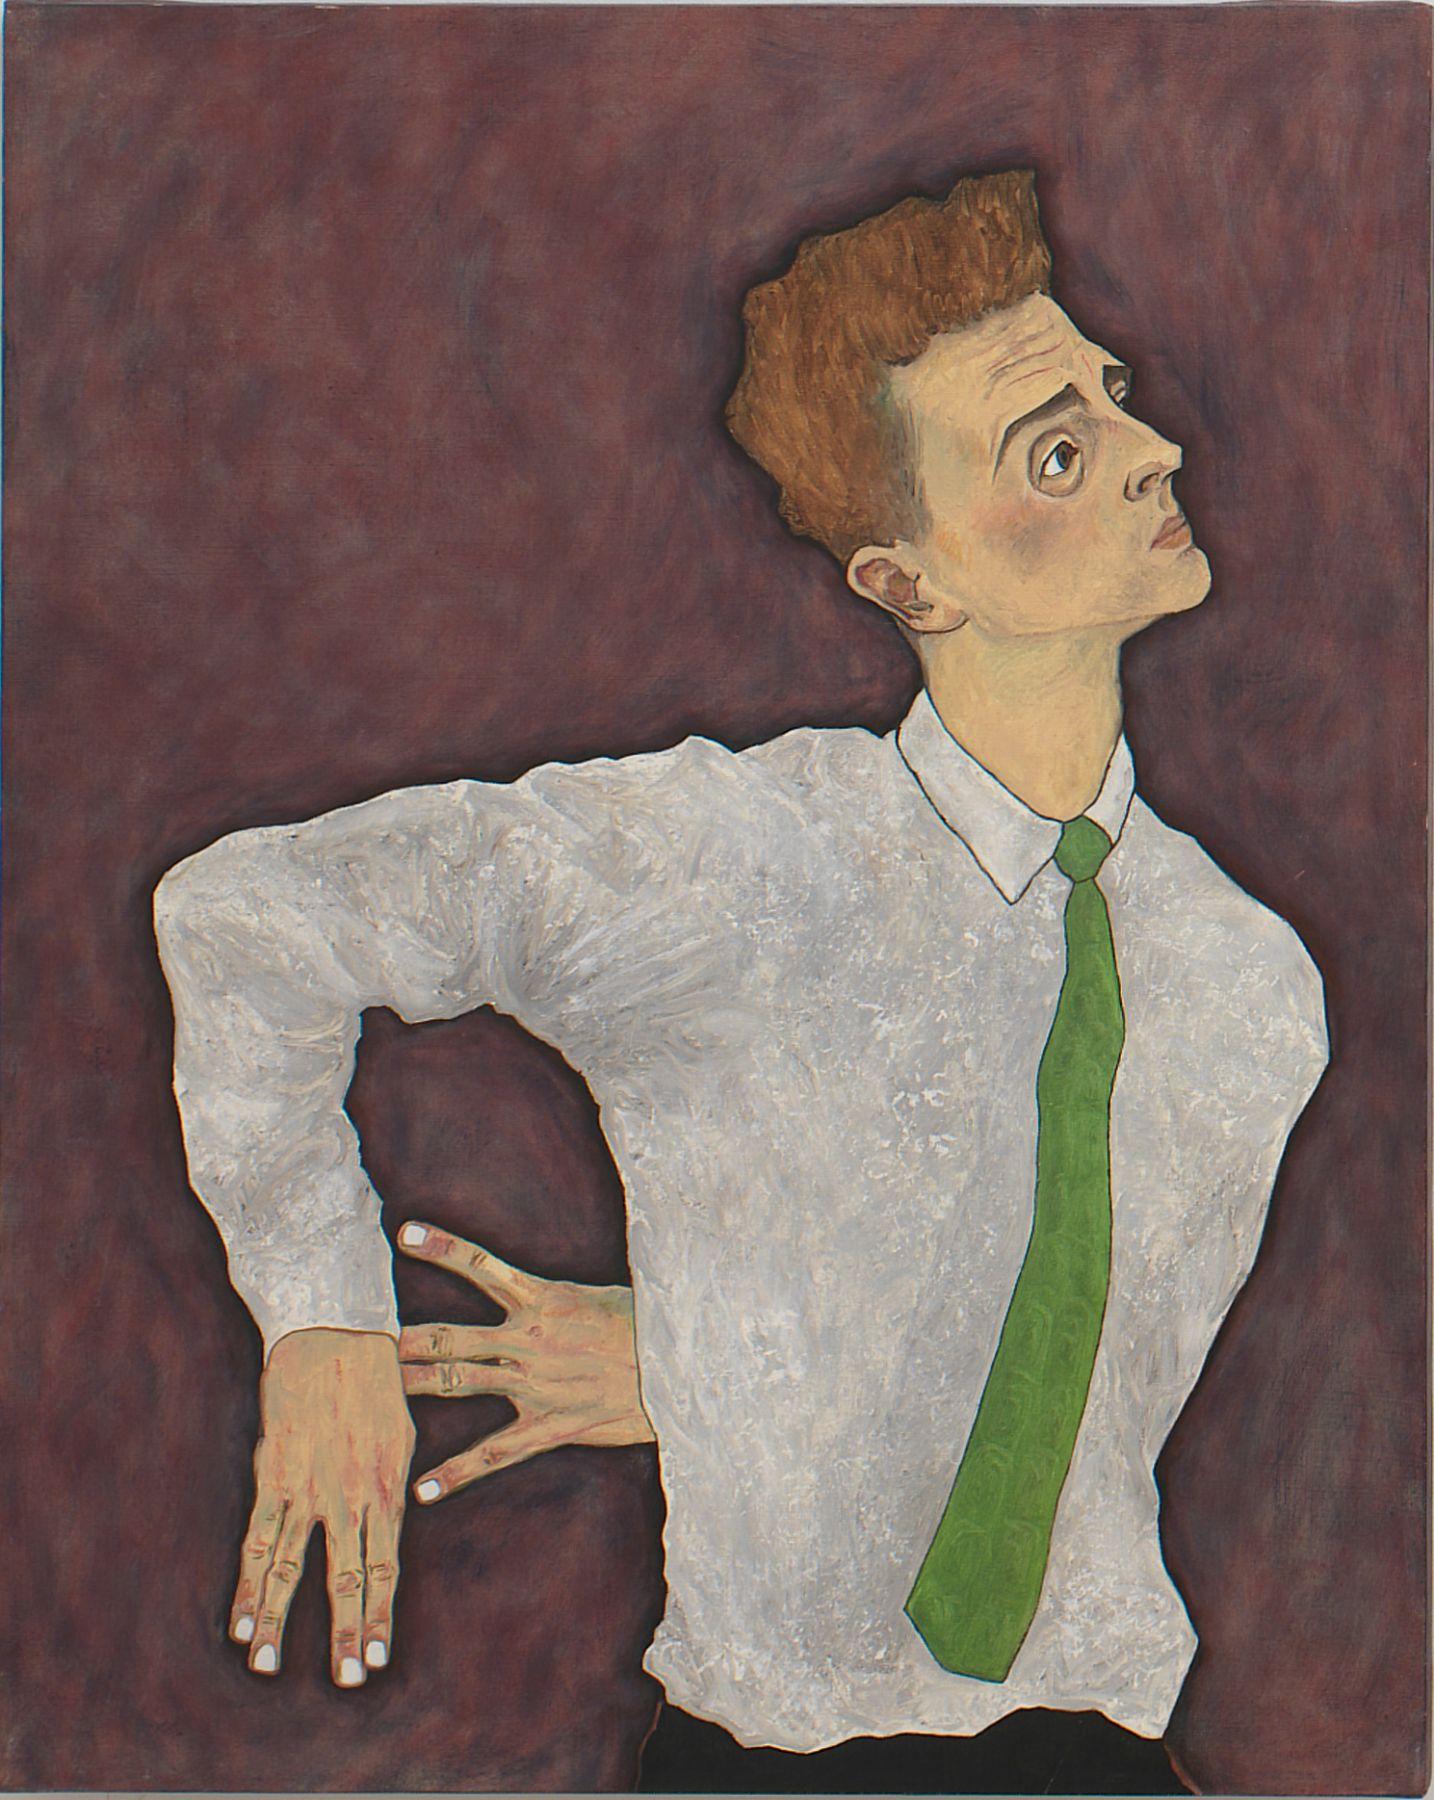 Self Portrait as Egon Schiele, 1996, Oil On Canvas